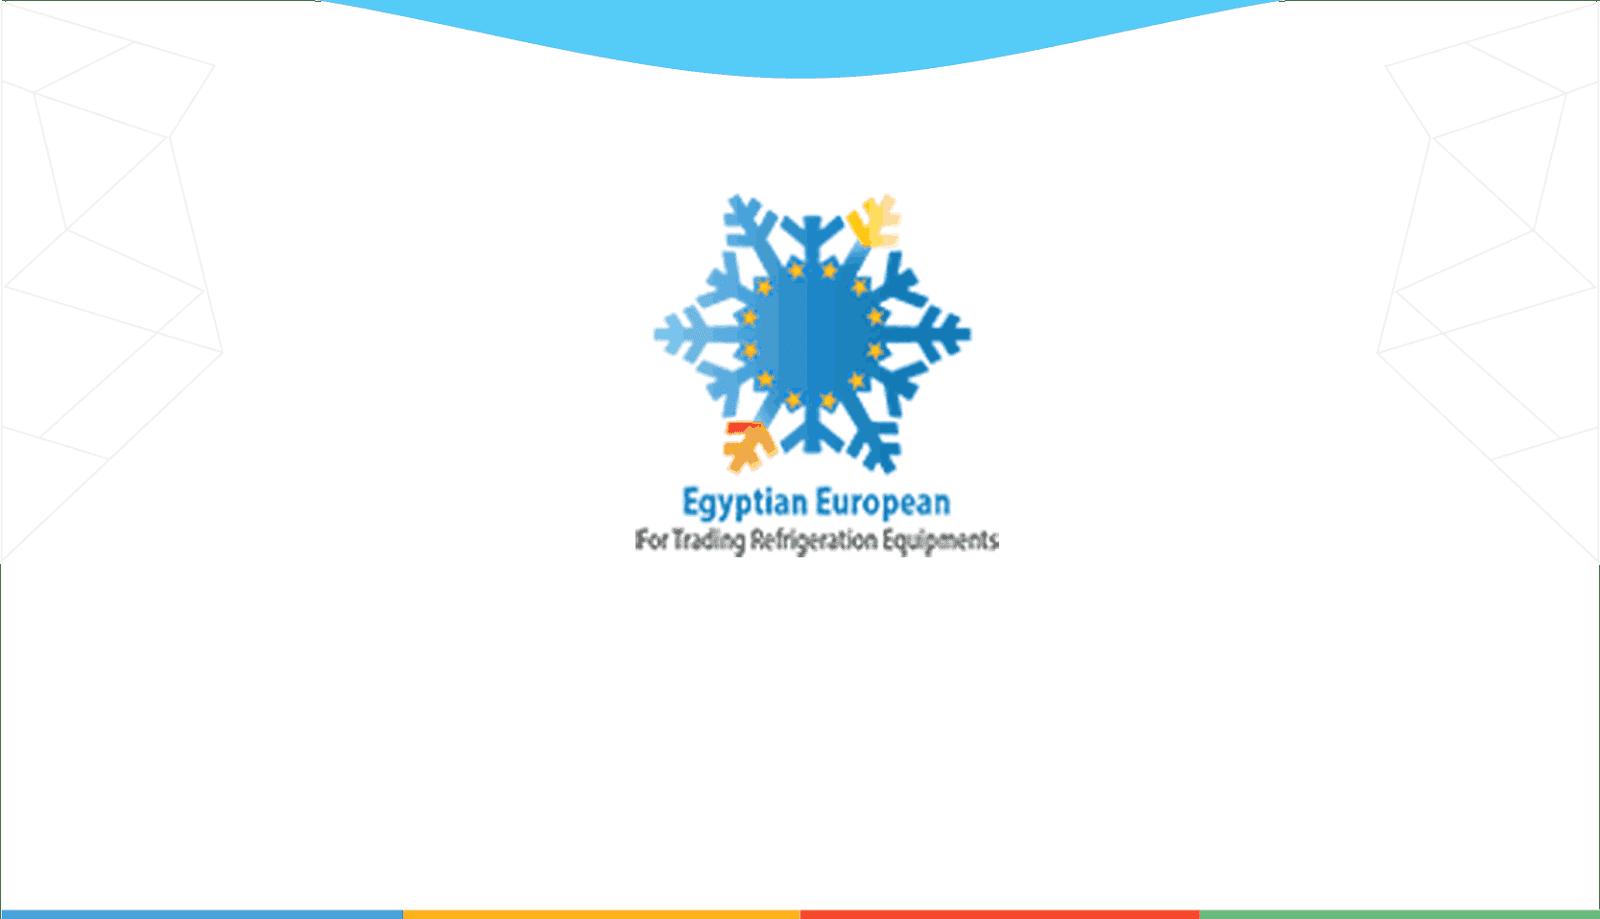 Egyptian European Company Careers | Logistics Assistant